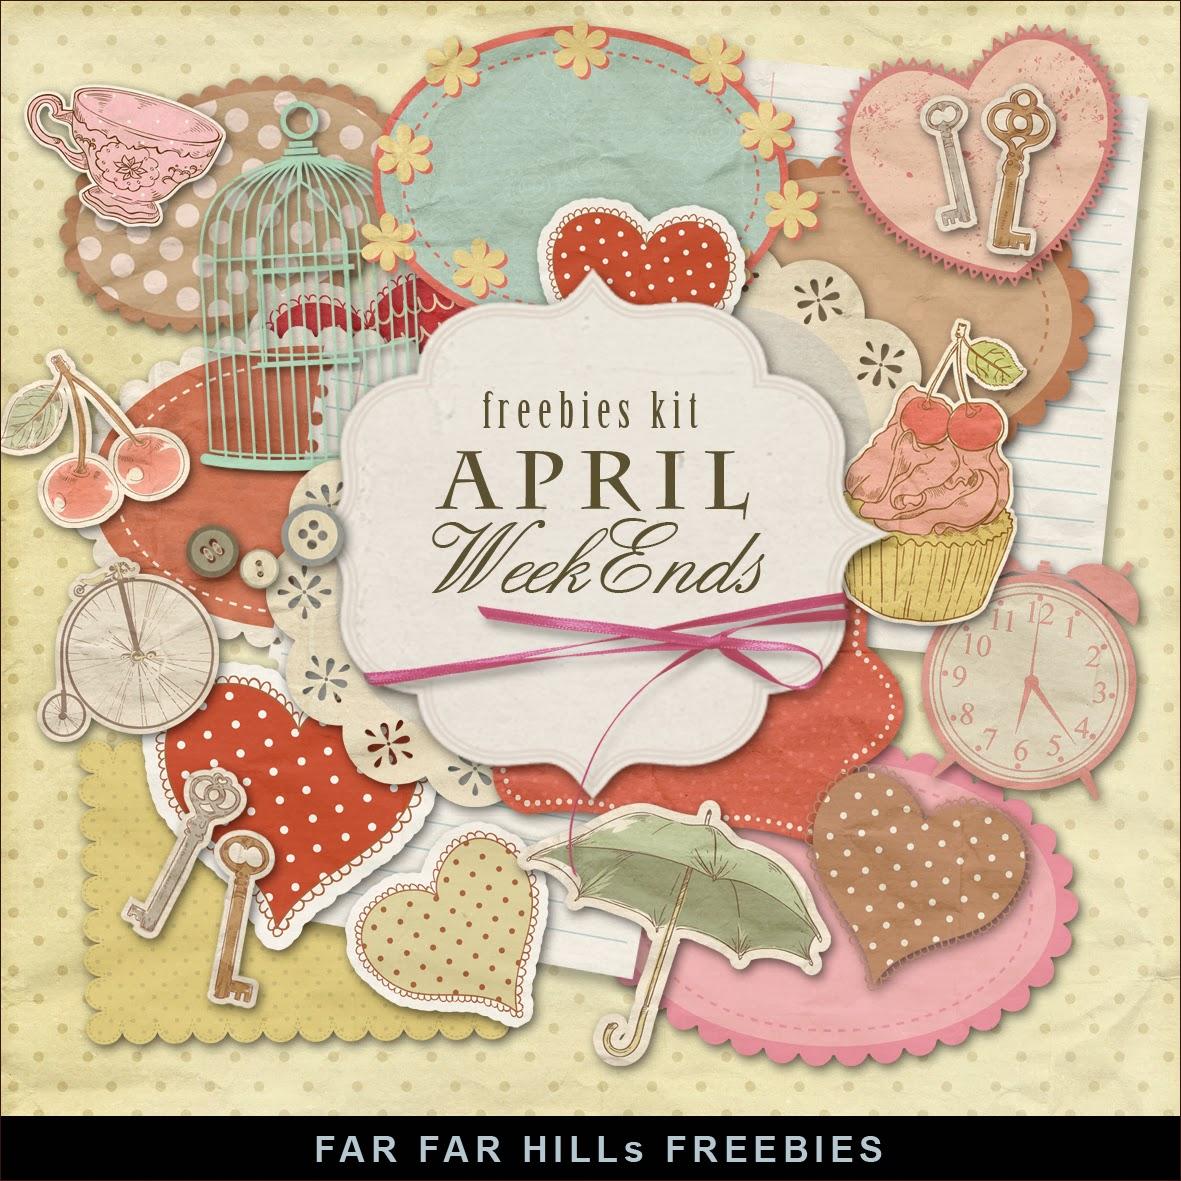 new freebies kit of labels april weekend far far hill free database of digital illustrations. Black Bedroom Furniture Sets. Home Design Ideas